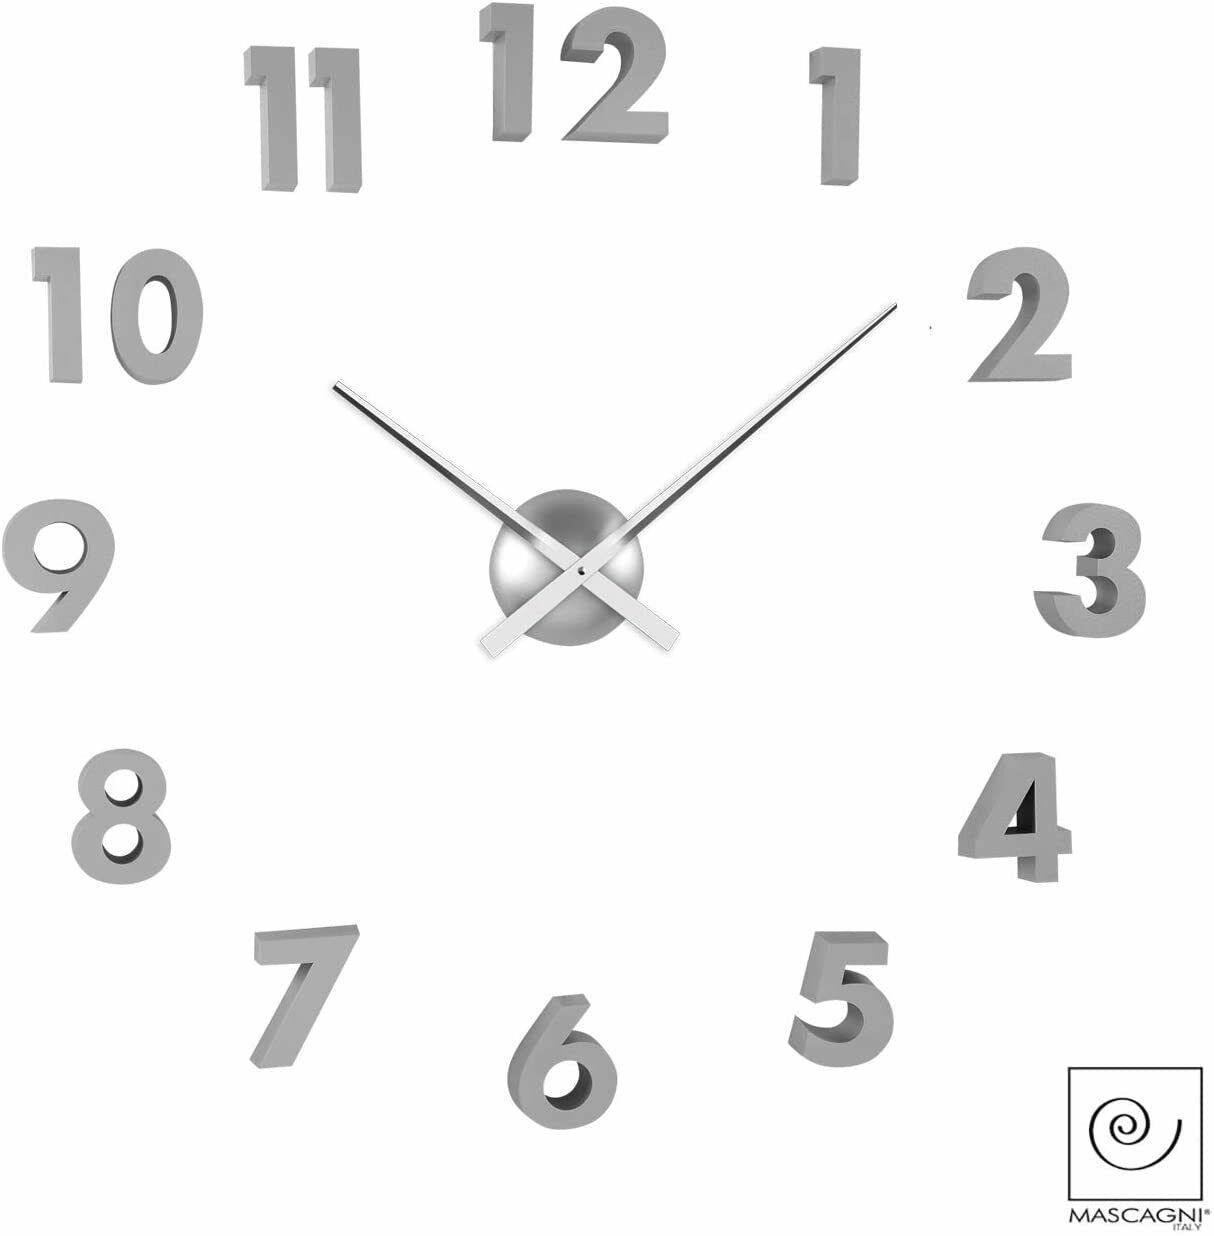 Mascagni Orologio da parete con numeri 3D in argento diametro 60 cm M580